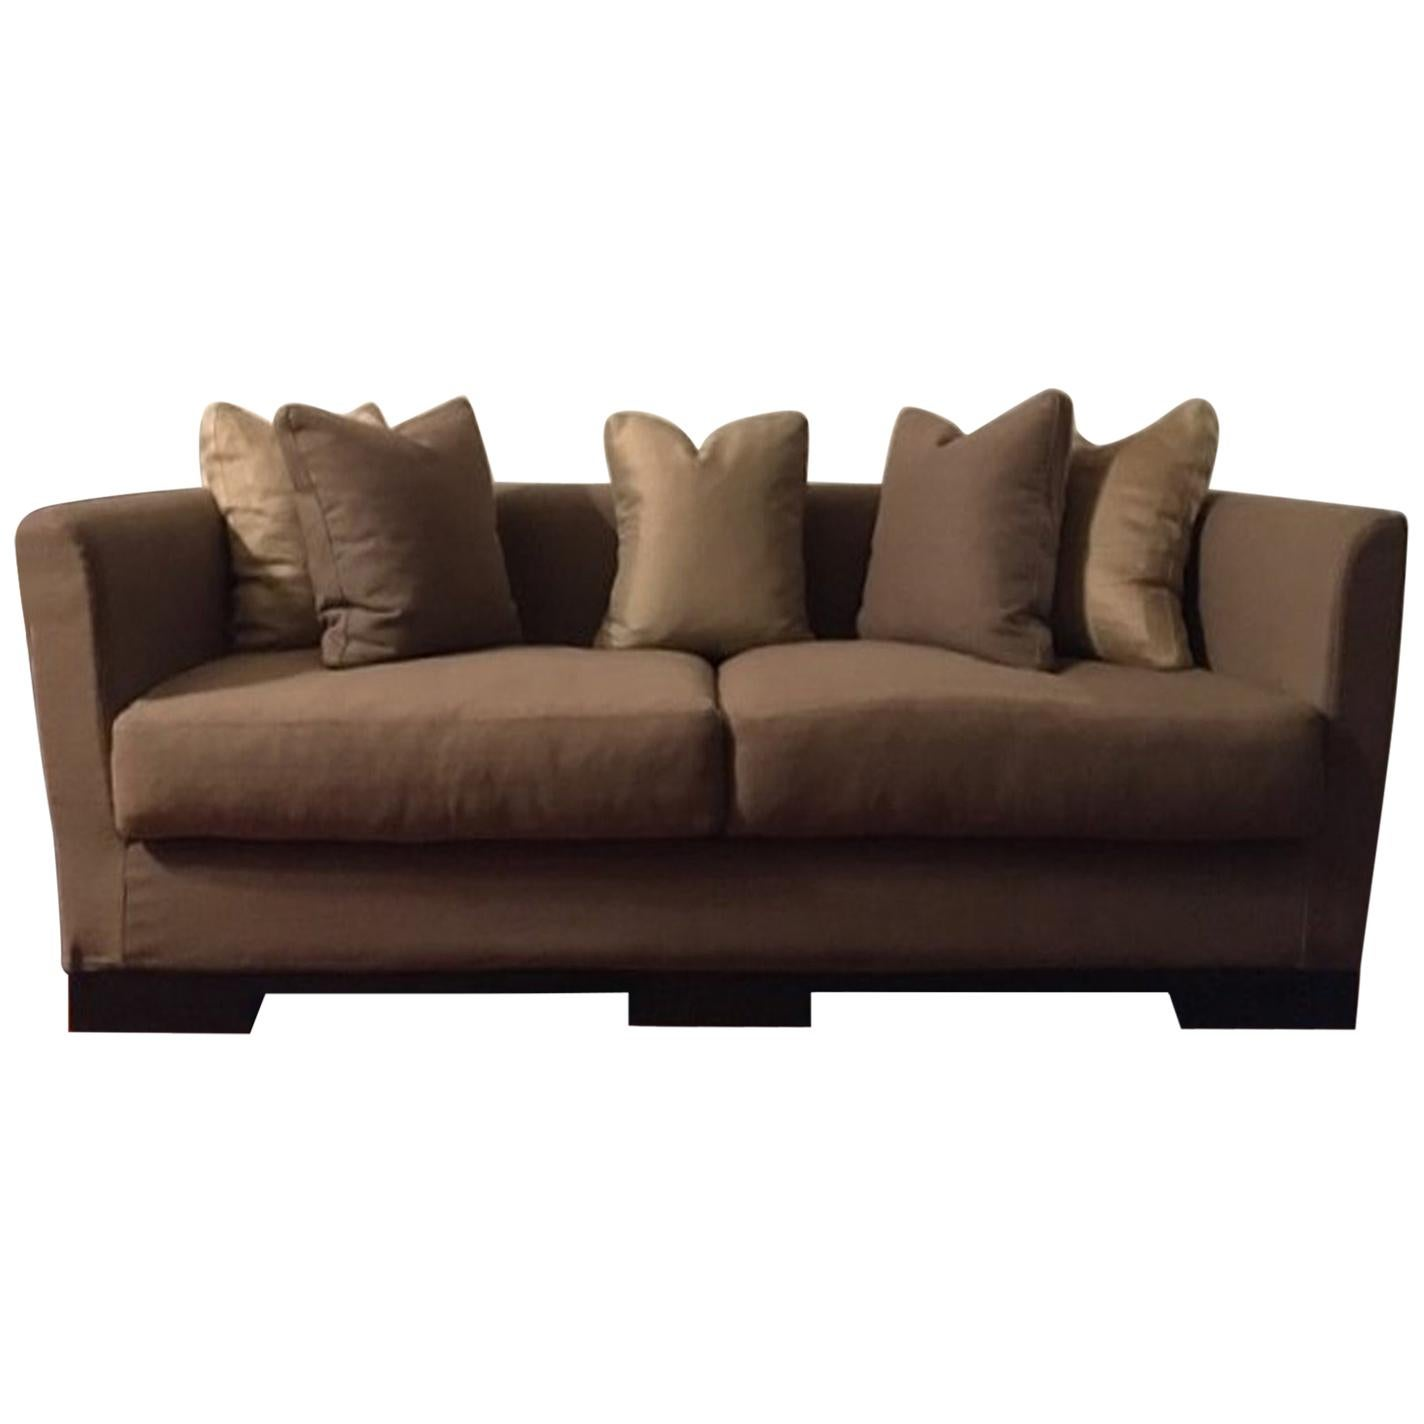 Italian Design Three Seats Upholstered Sofa Contemporary Production